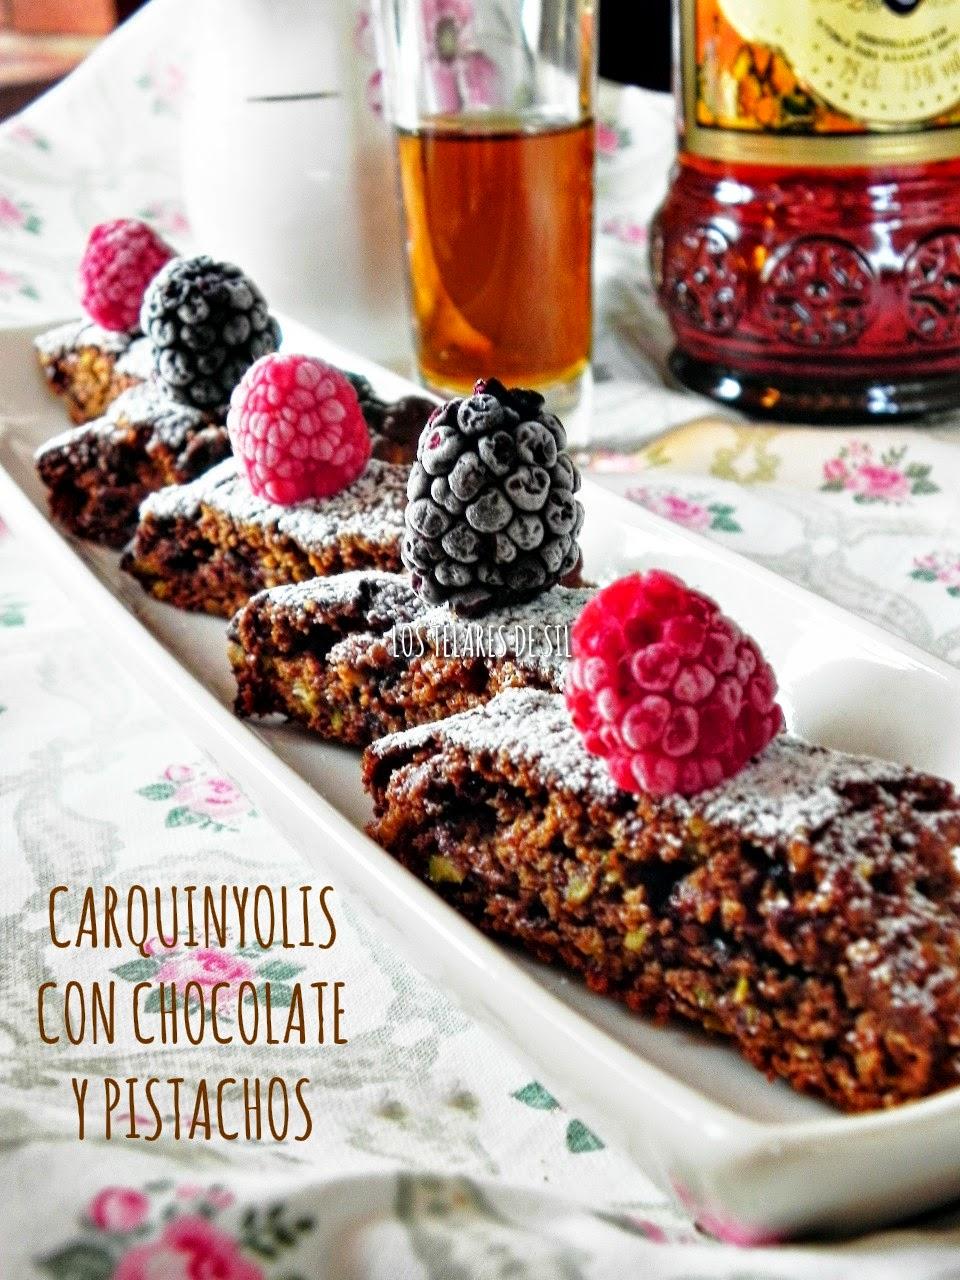 CARQUINYOLIS DE CHOCOLATE CON PISTACHOS